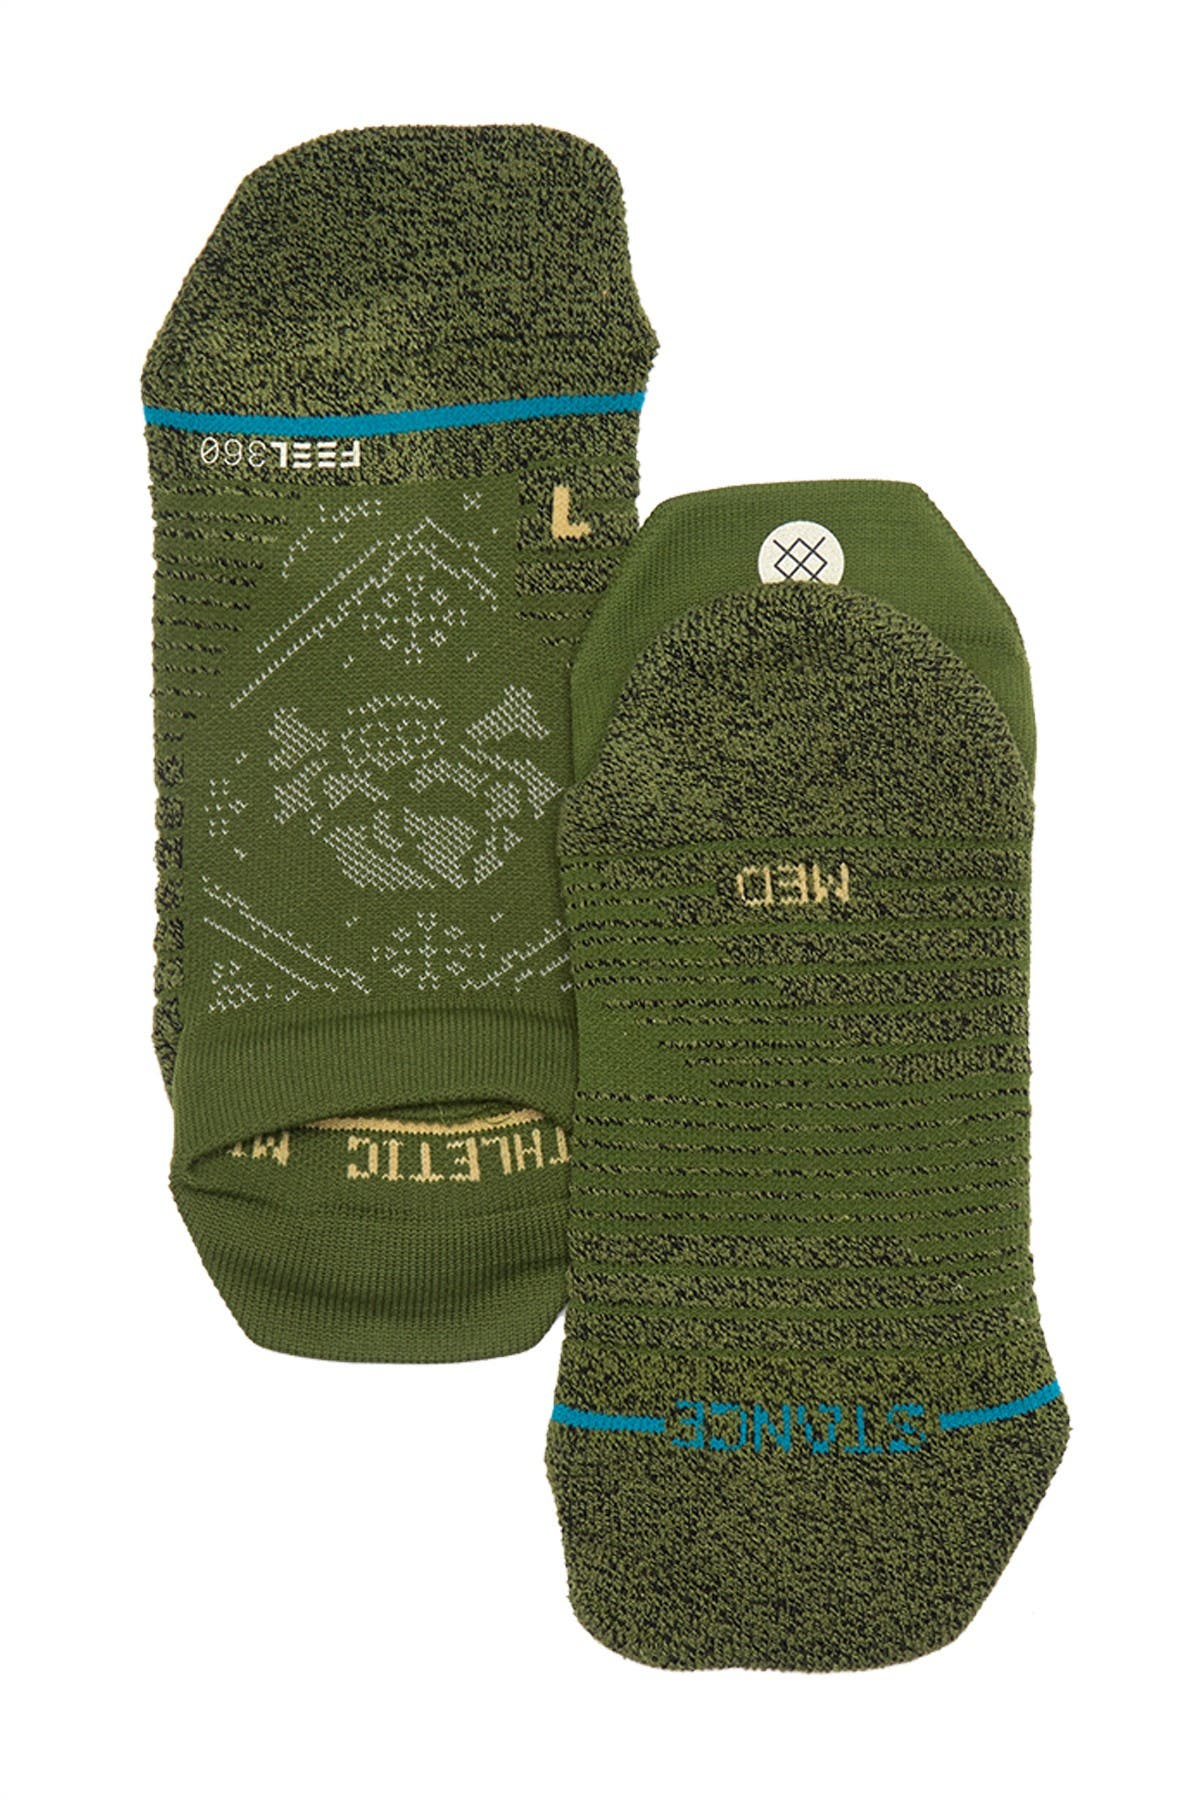 Image of Stance Skulldana Tab Low Cut Socks